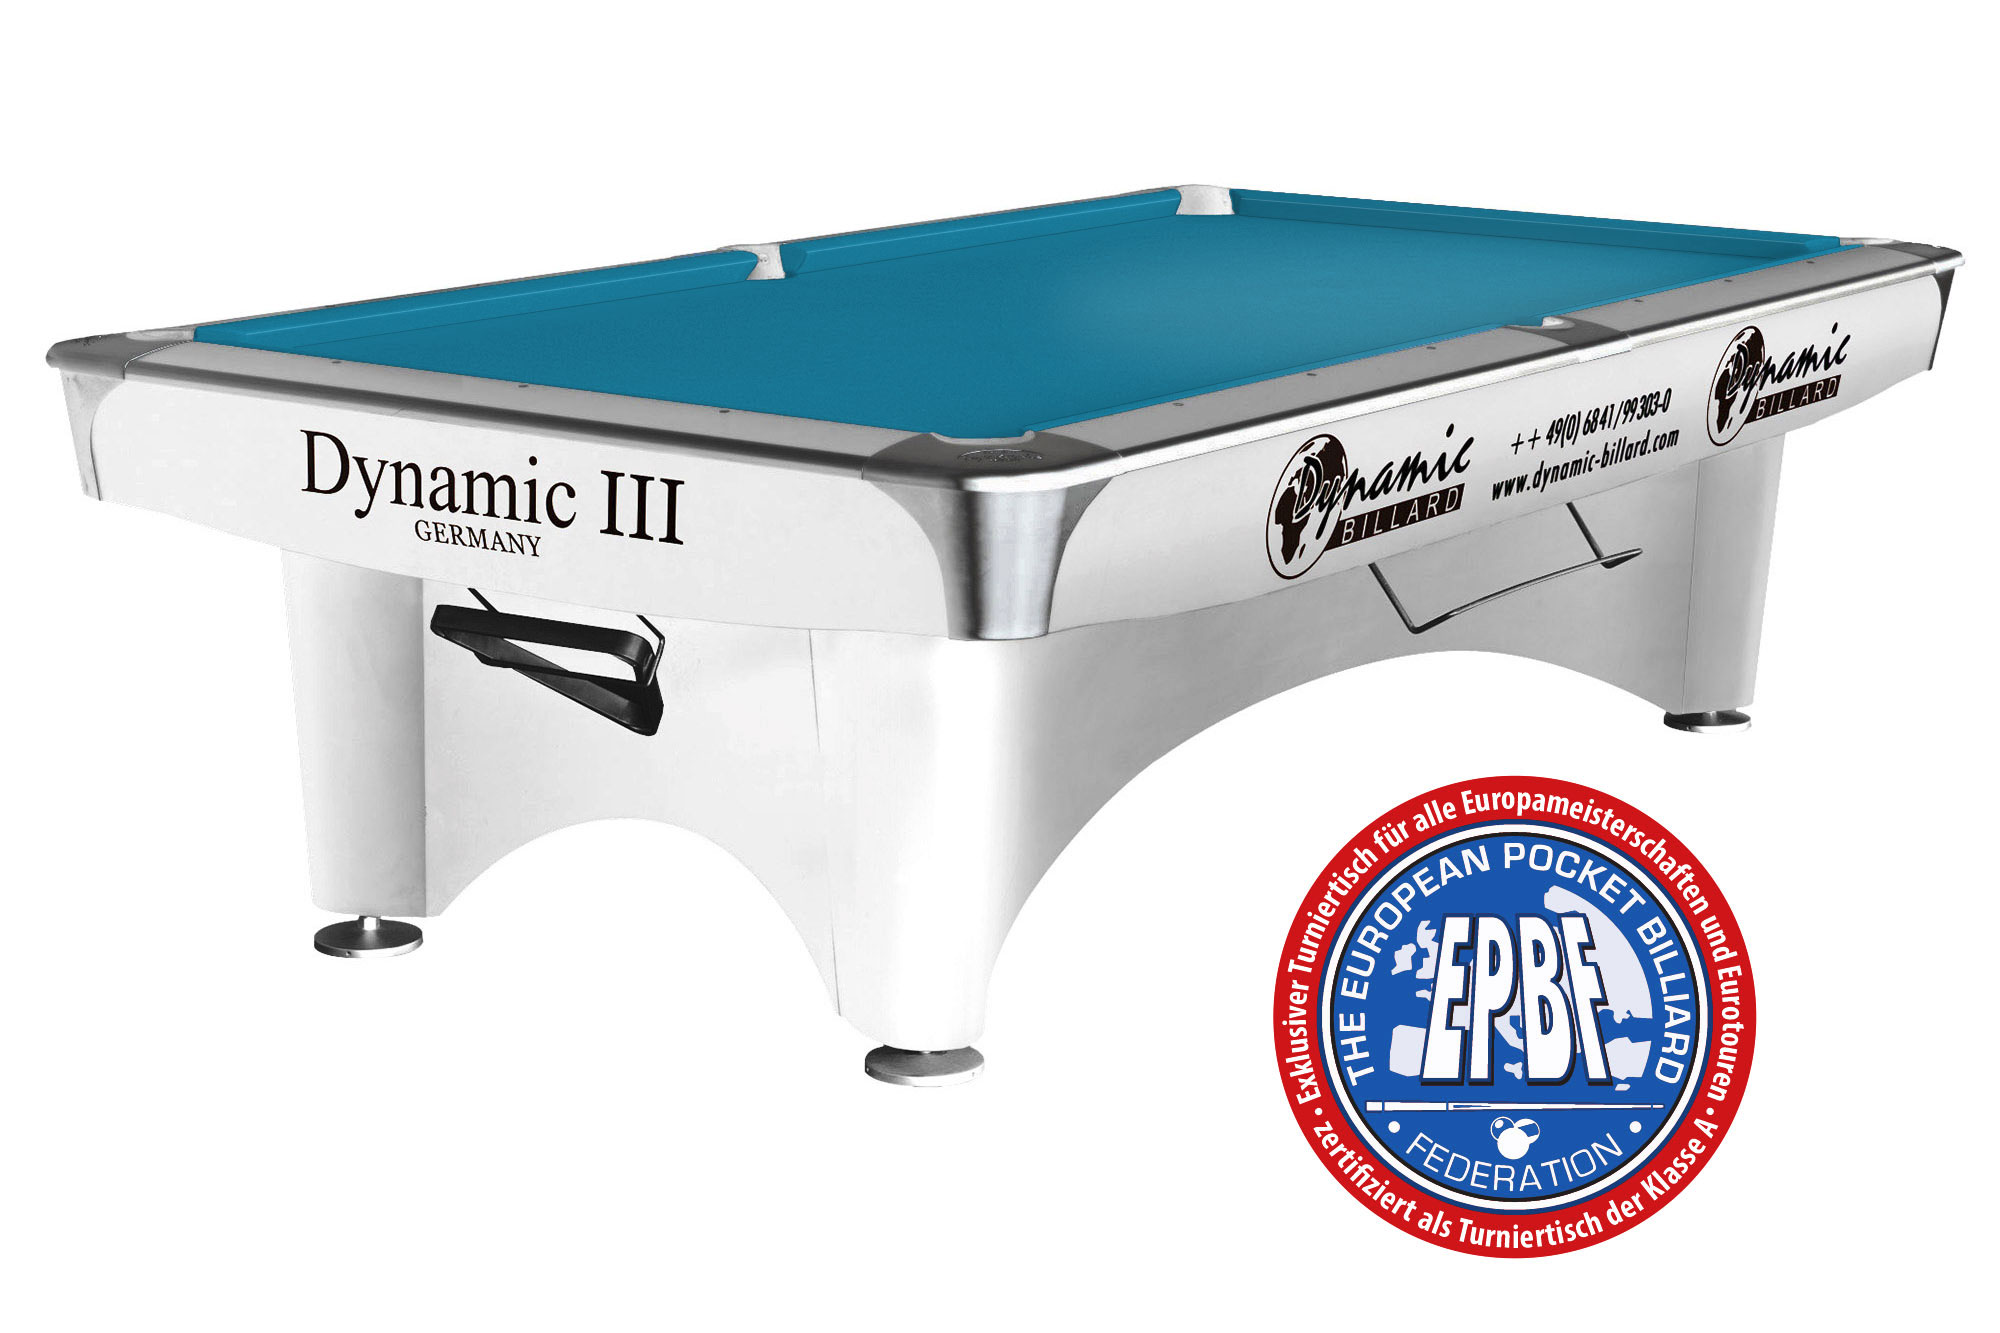 billardtisch pool dynamic iii 9 ft fu gl nzend wei pool billardtische 9ft fu. Black Bedroom Furniture Sets. Home Design Ideas